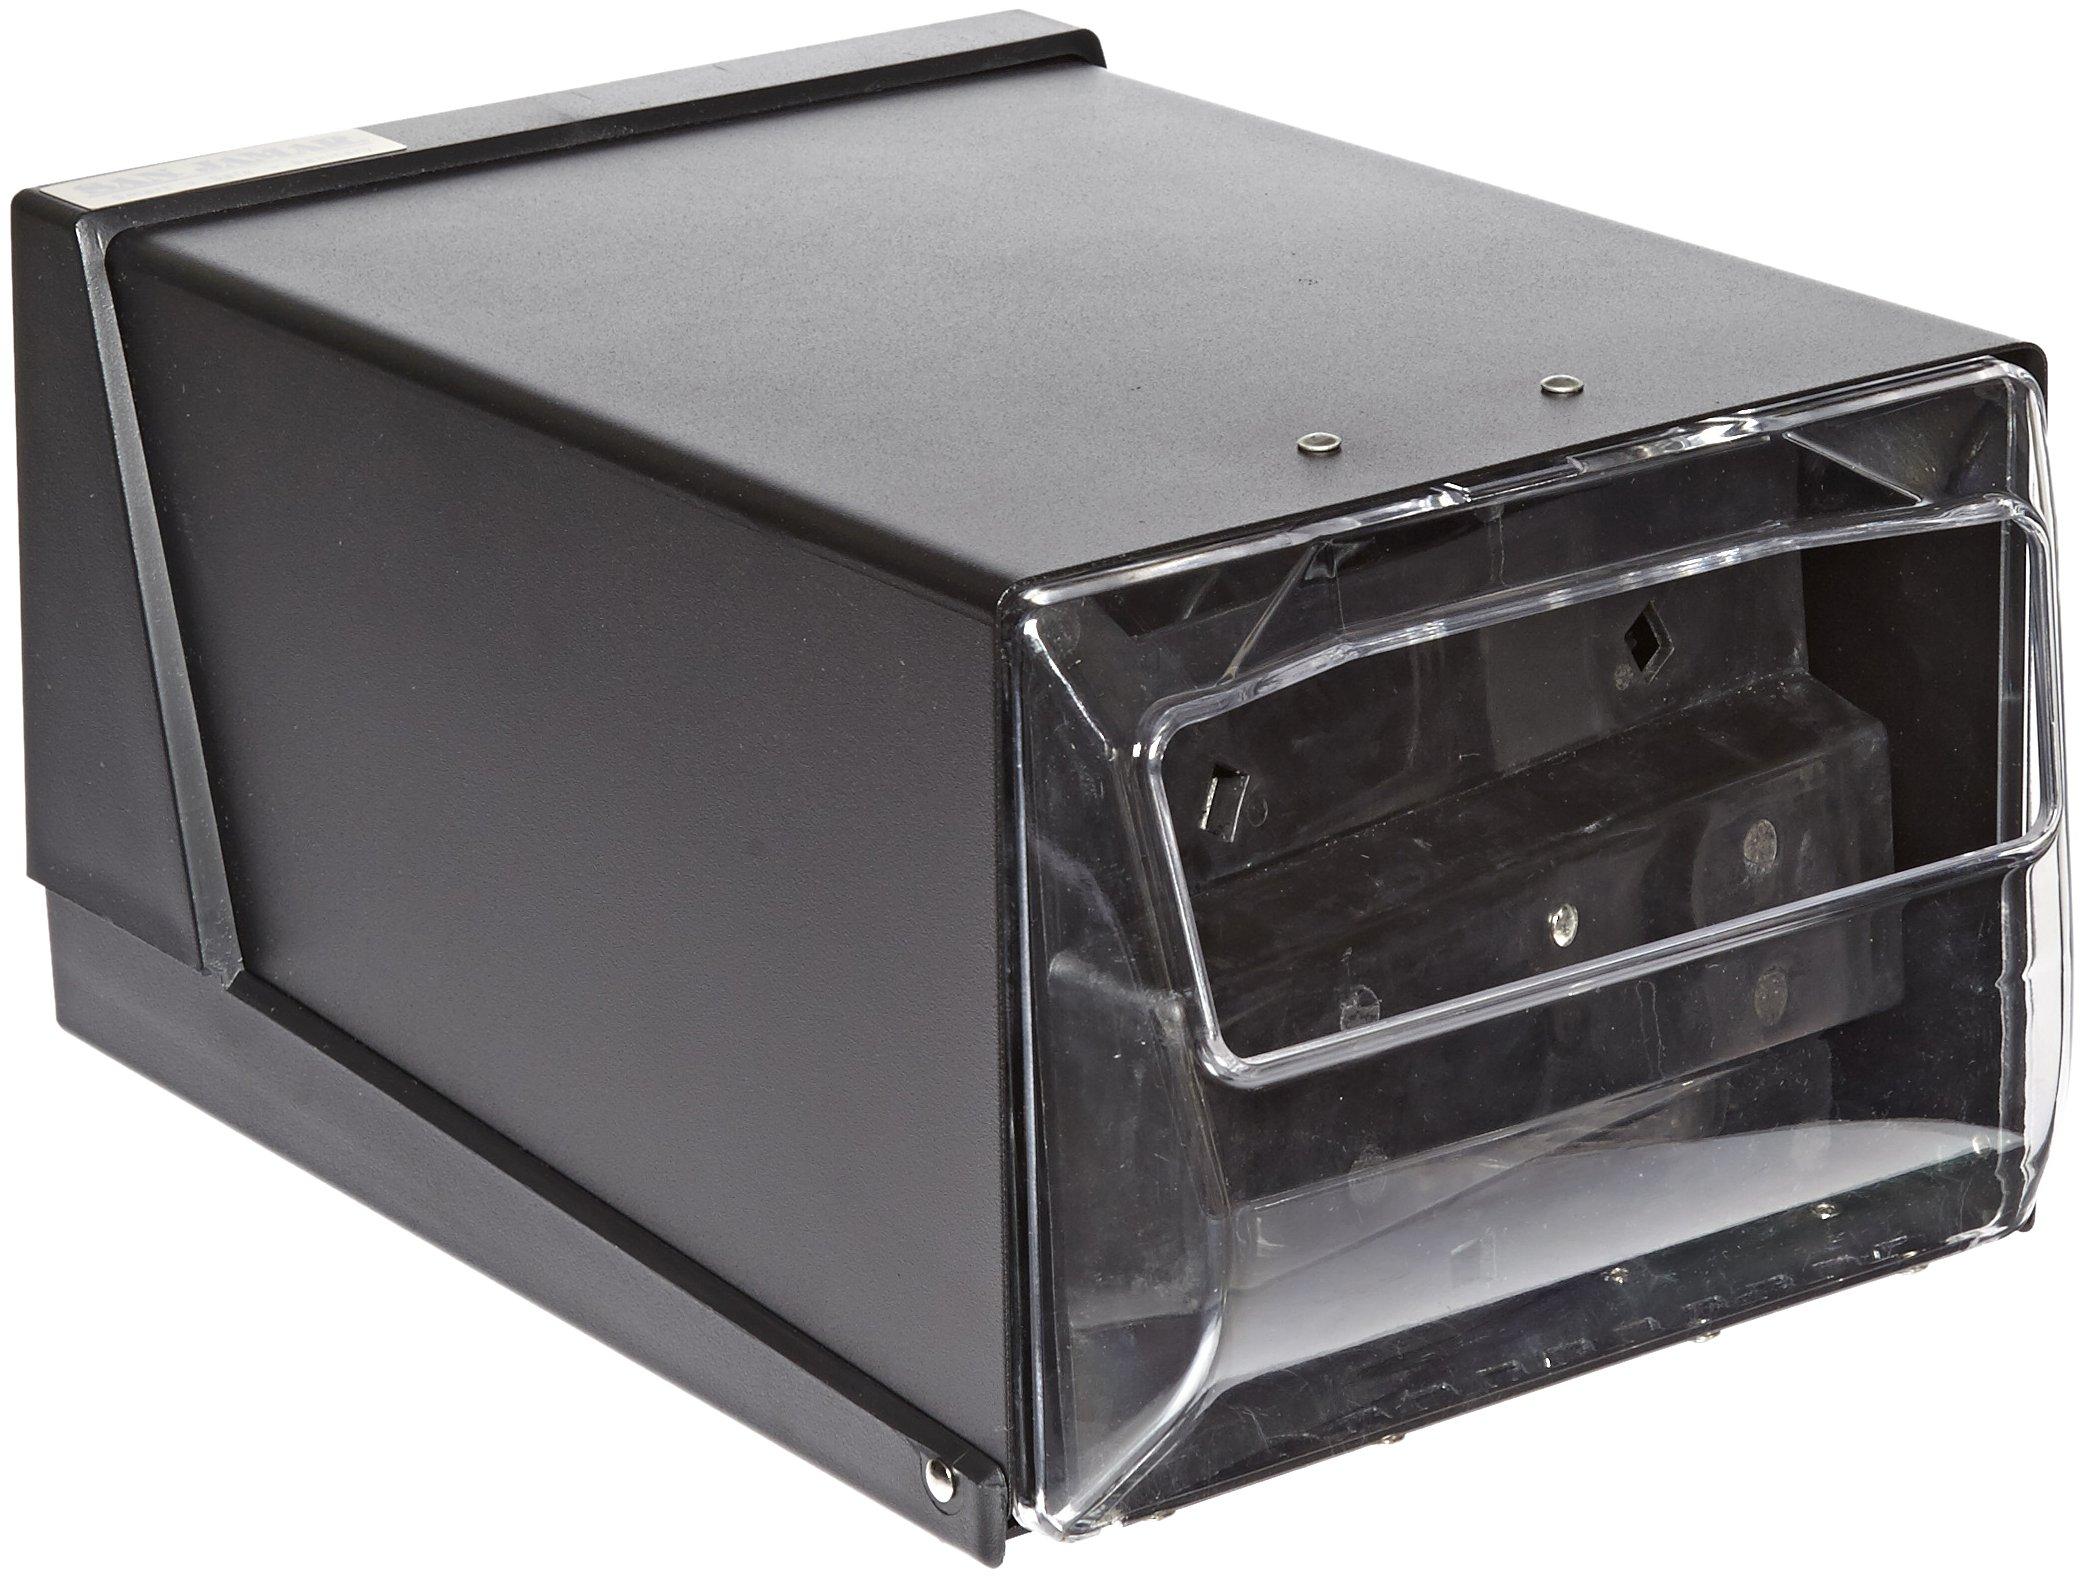 San Jamar H3001 Countertop Fullfold Napkin Dispenser, 300 Capacity, 7-5/8'' Width x 5-1/2'' Height x 11'' Depth, Clear/Black by San Jamar